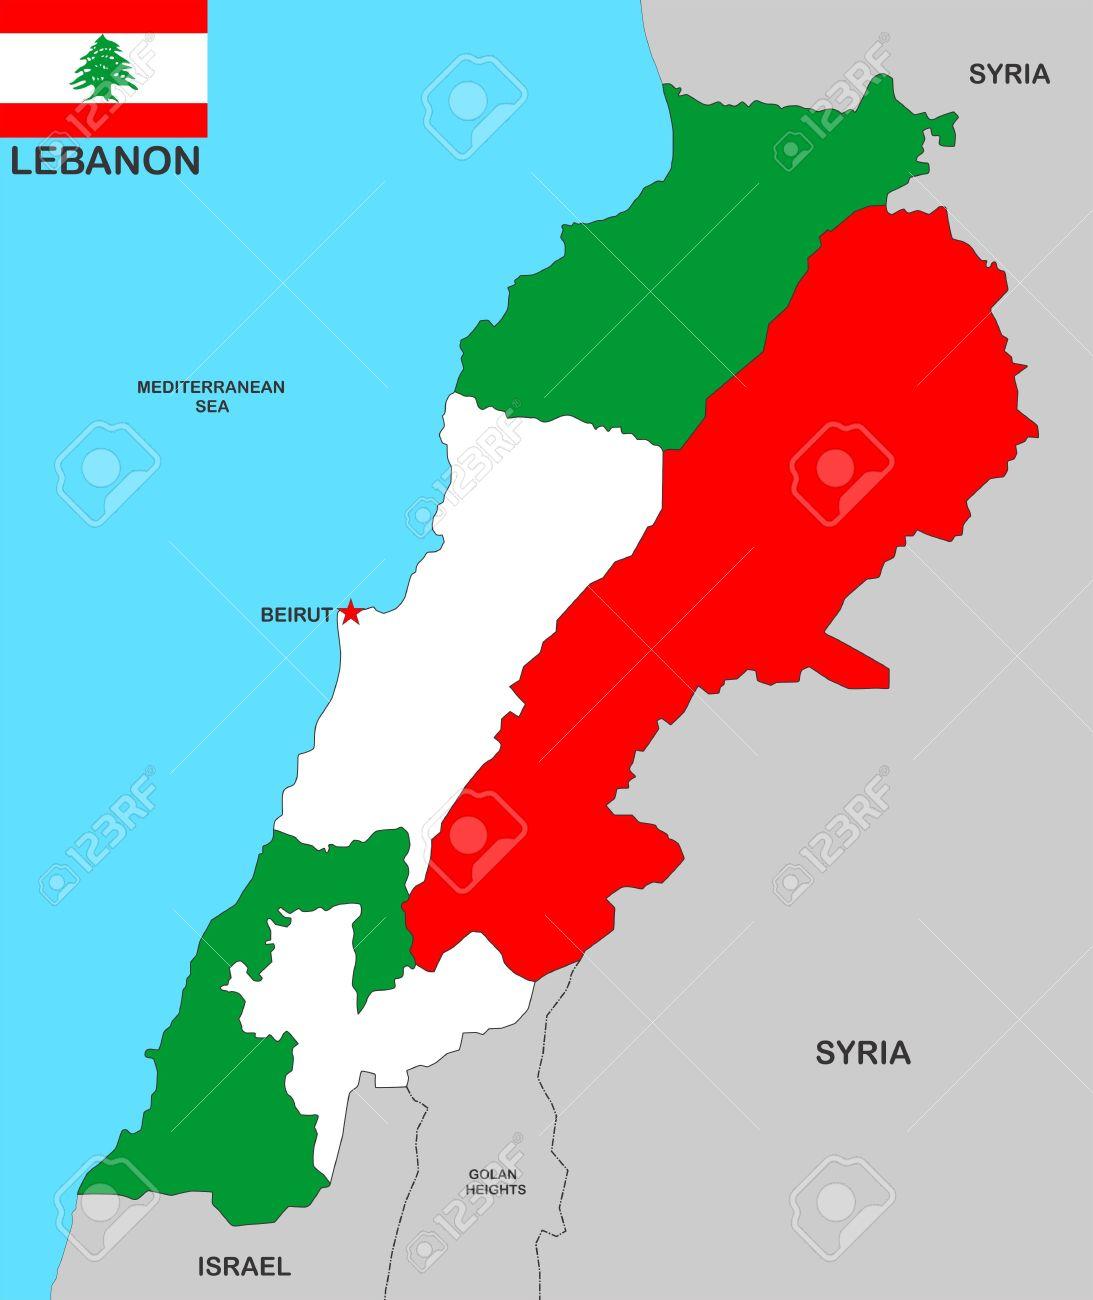 Very Big Size Lebanon Political Map Illustration Stock Photo